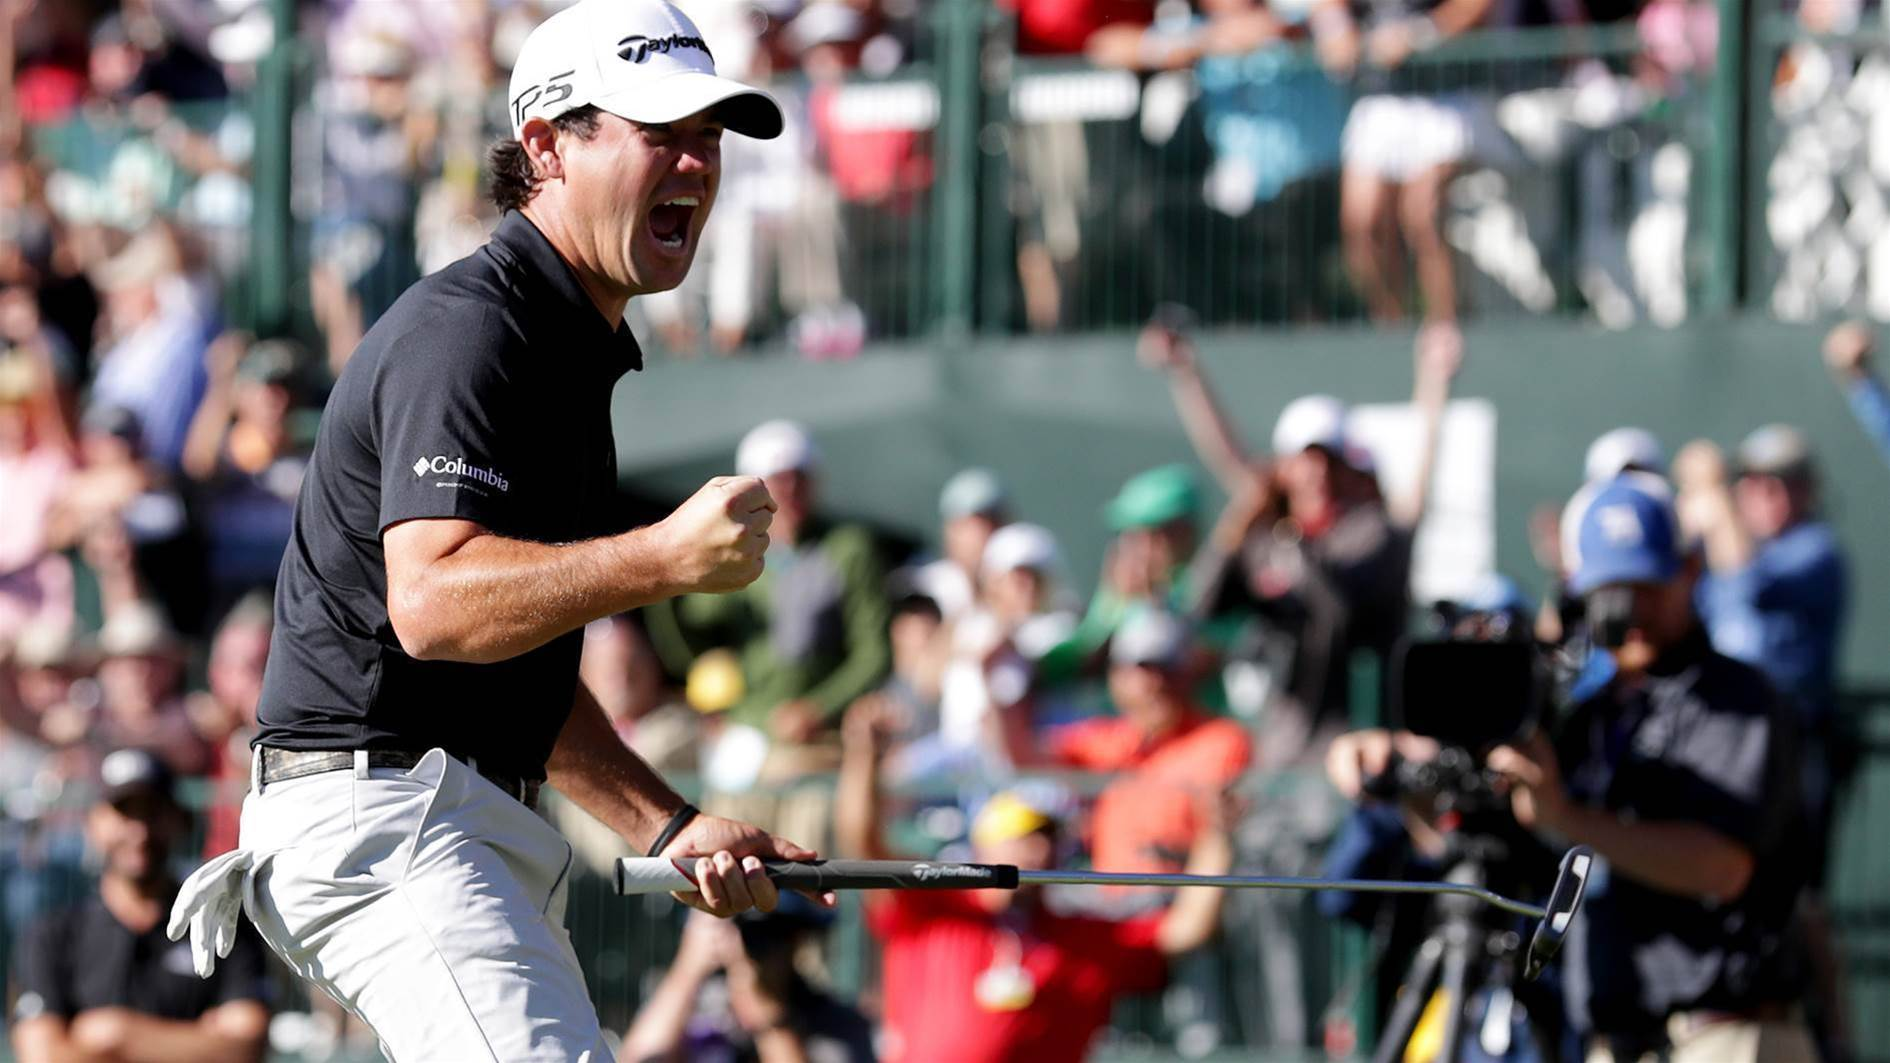 PGA TOUR: Harman birdie denies DJ fourth straight win